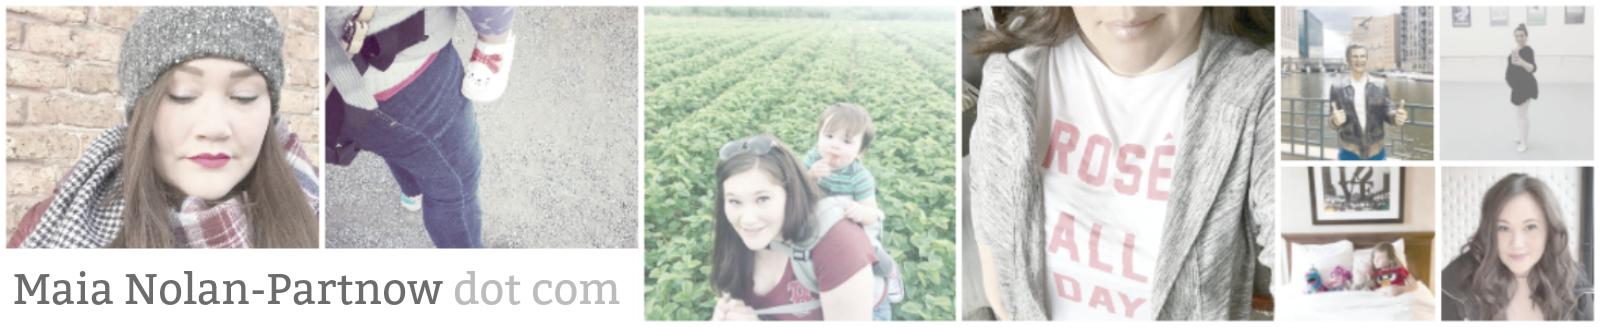 Blog | Maia Nolan-Partnow